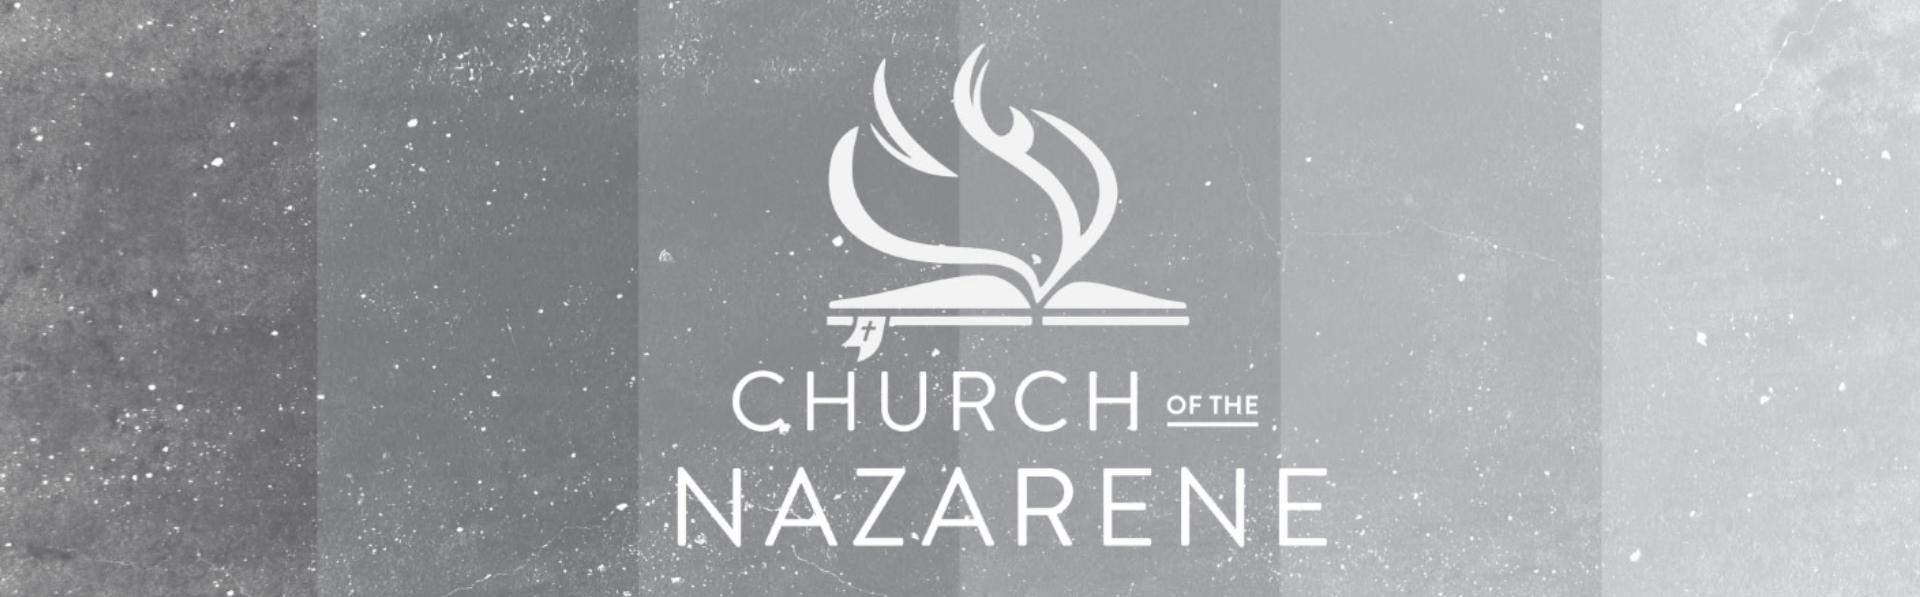 nazarene-wallpaper_skinny.png